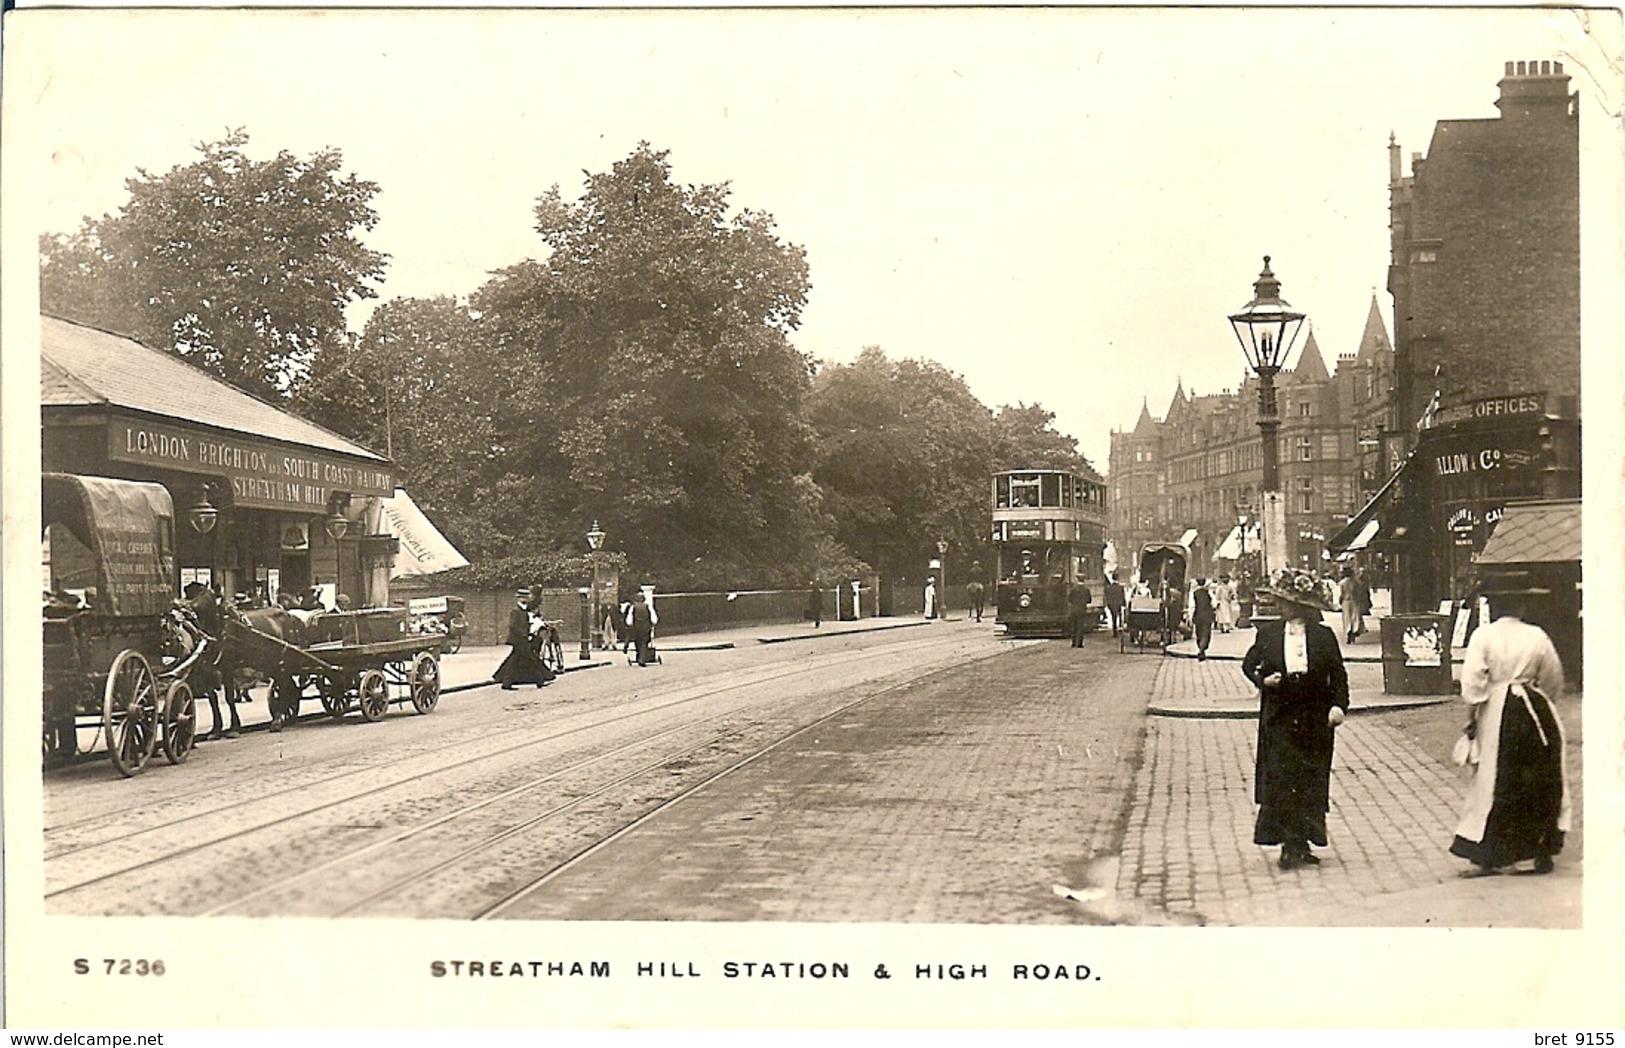 STREATHAM HILL STATION & HIGH ROAD - London